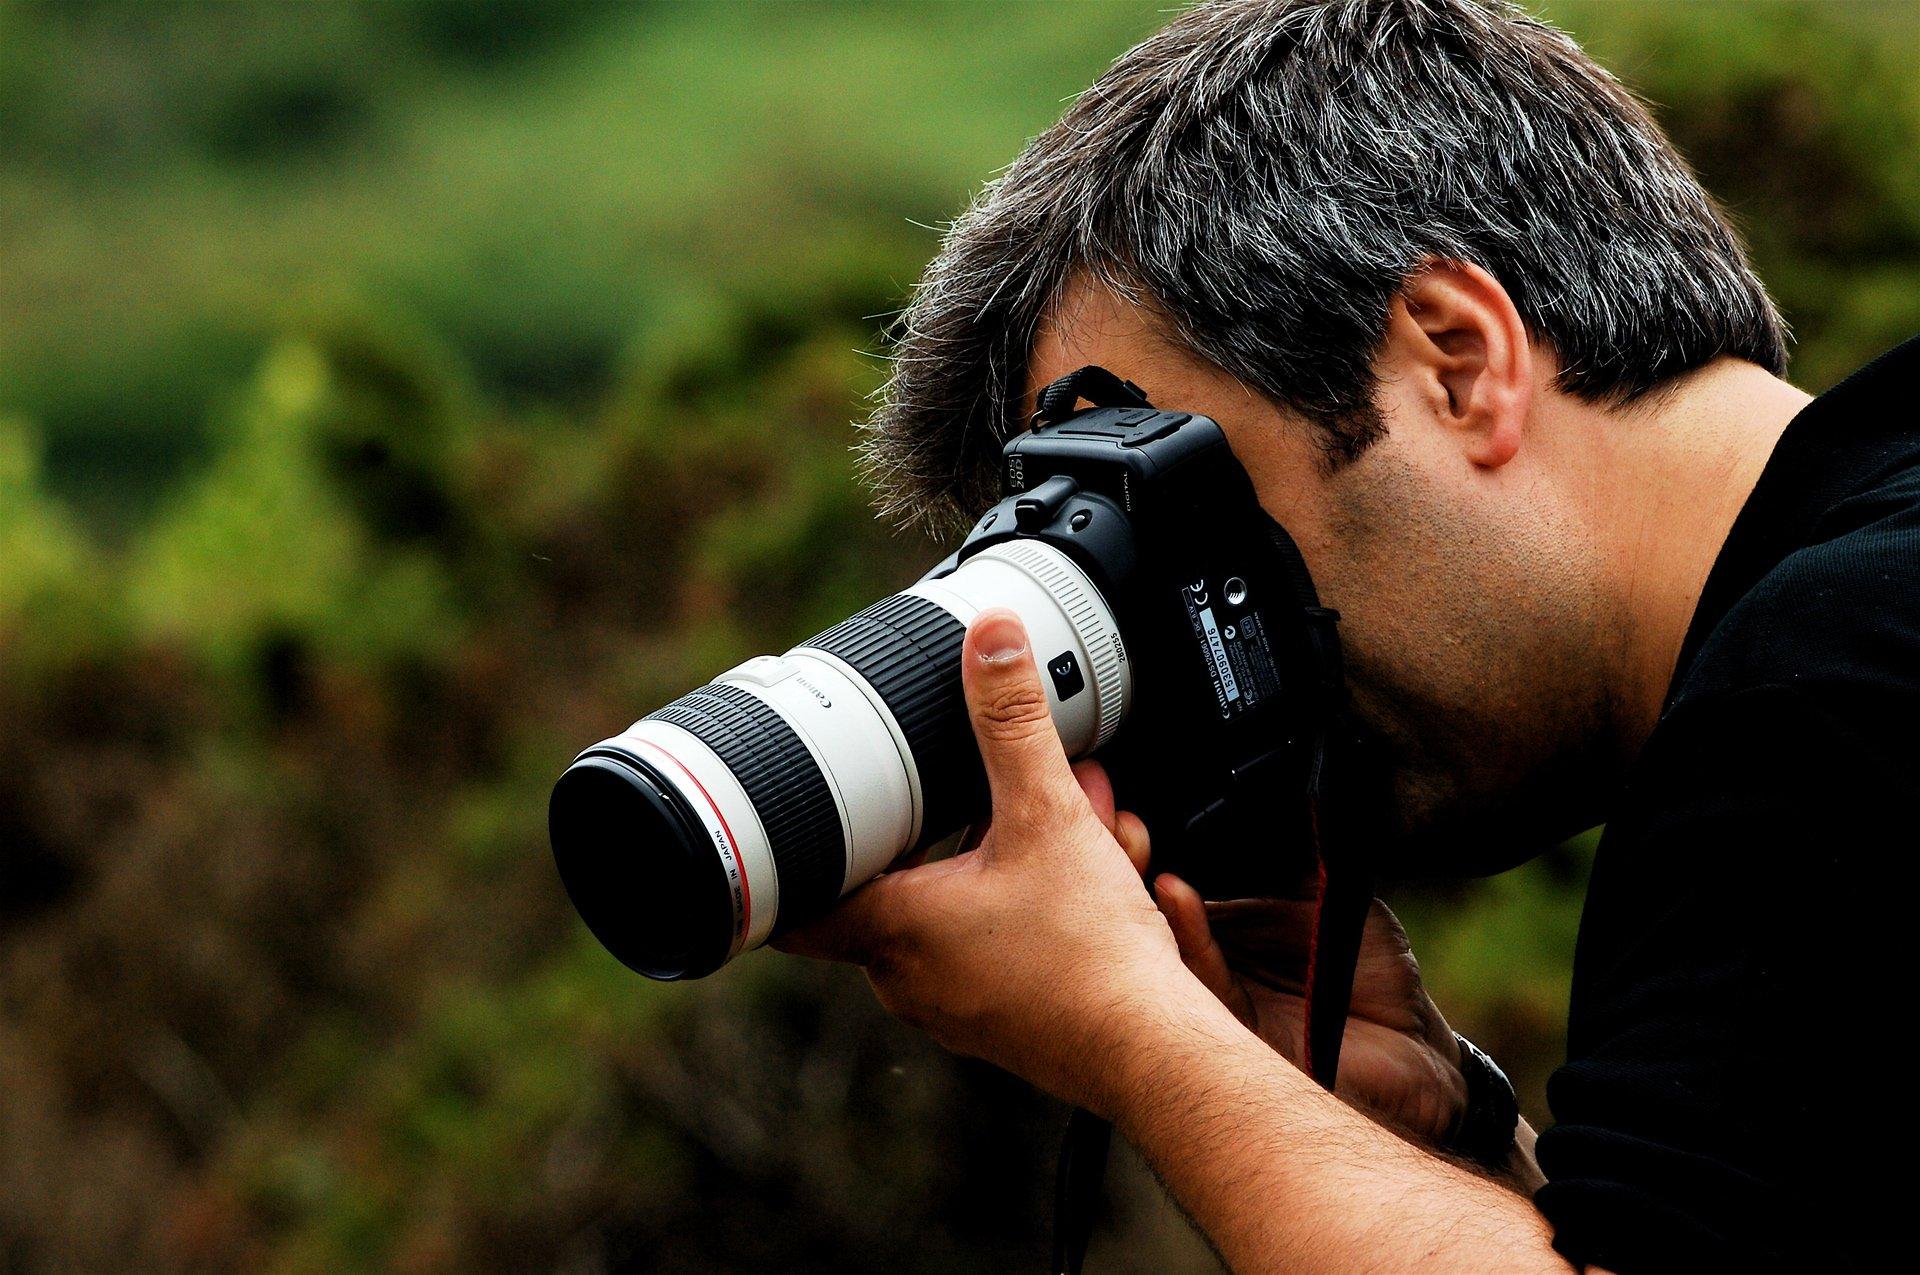 нем картинки услуги фотографа живут